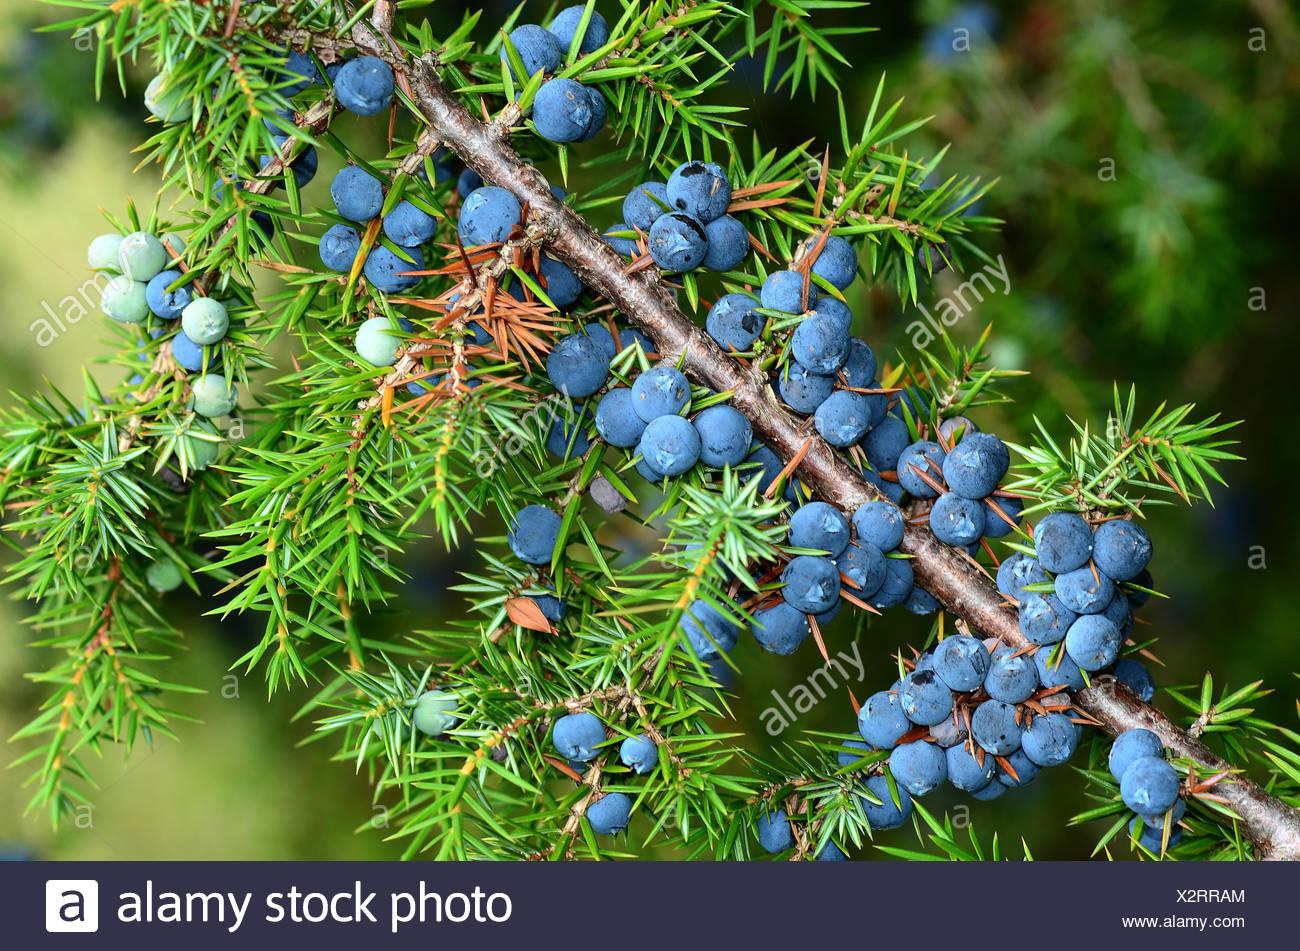 Junipers Berries Stock Photo 277118428 Alamy